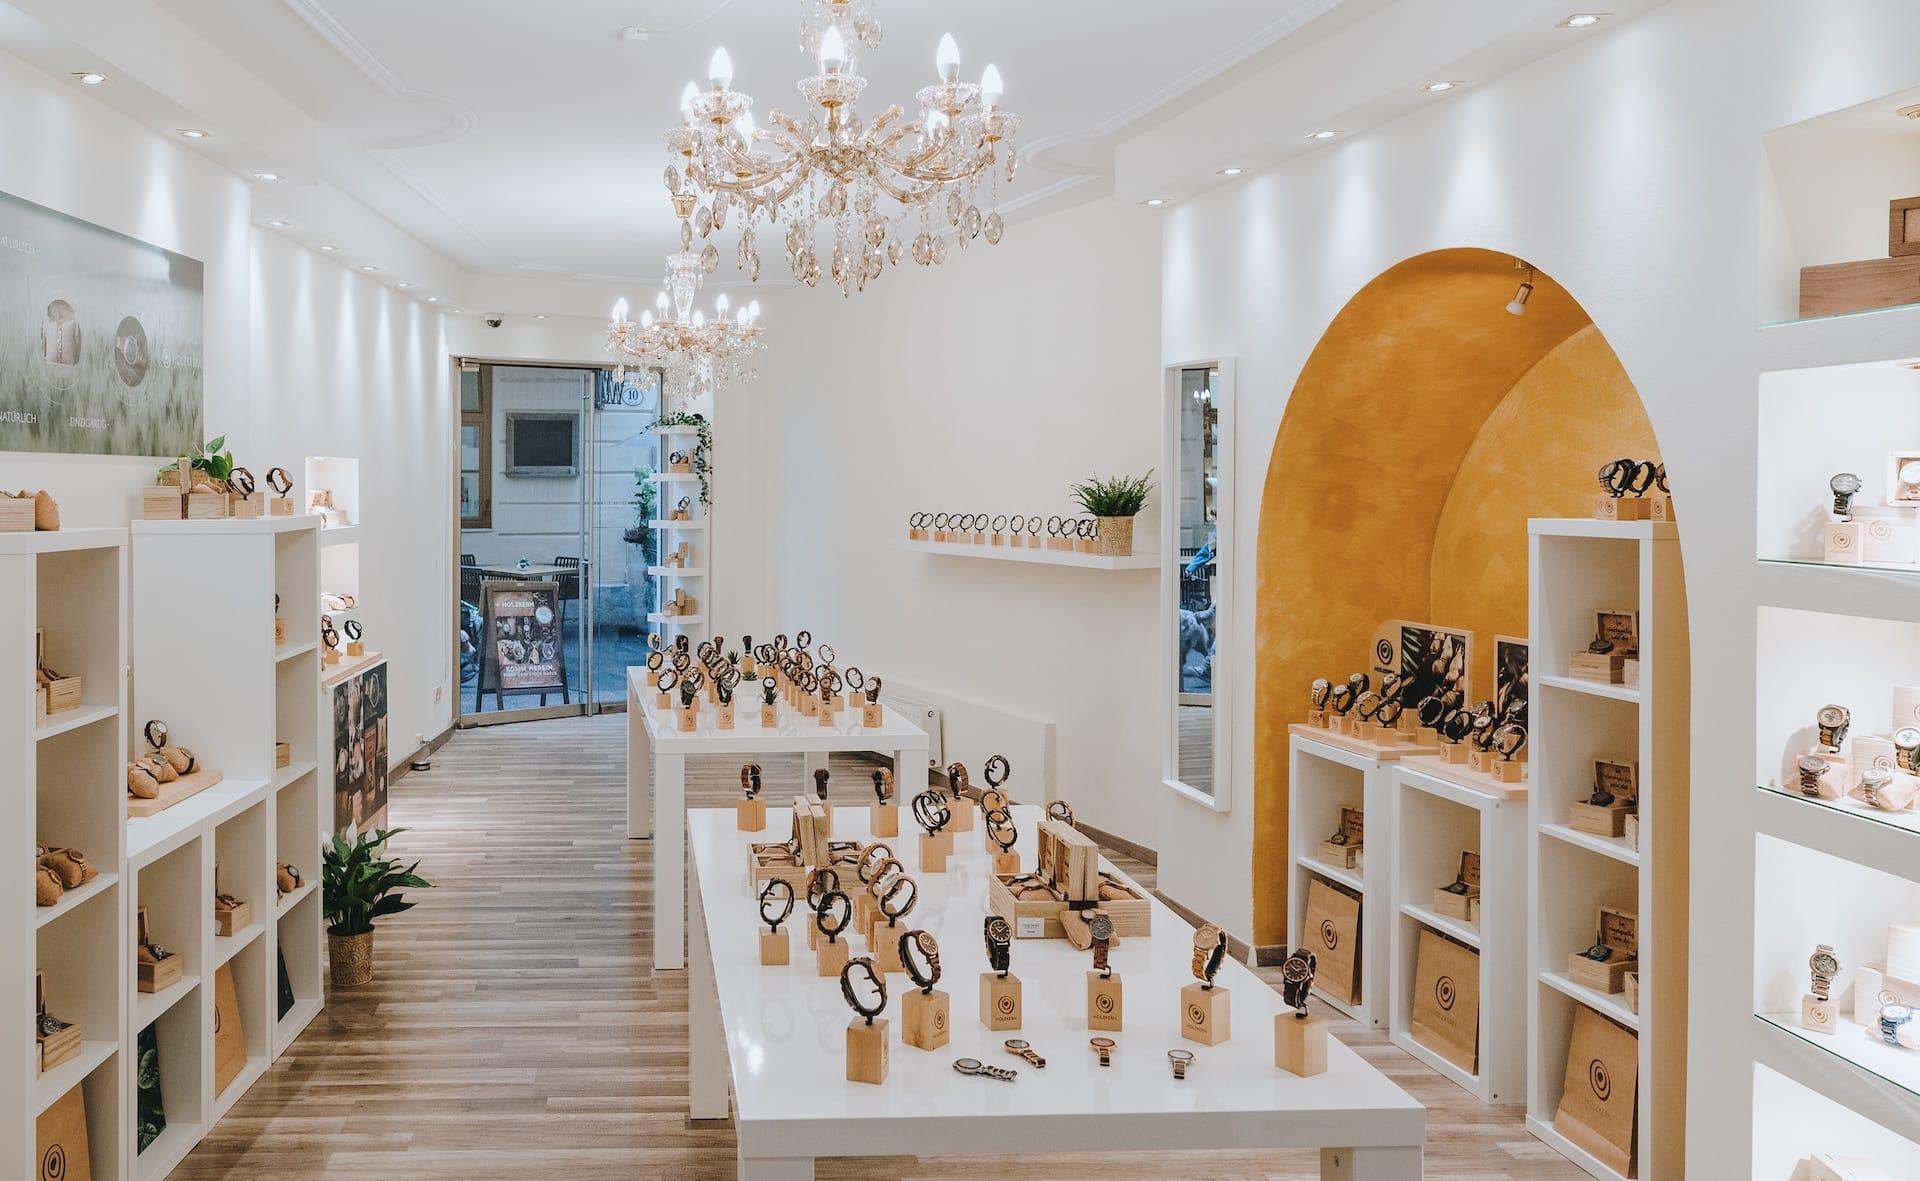 Holzkern Store Salzburg